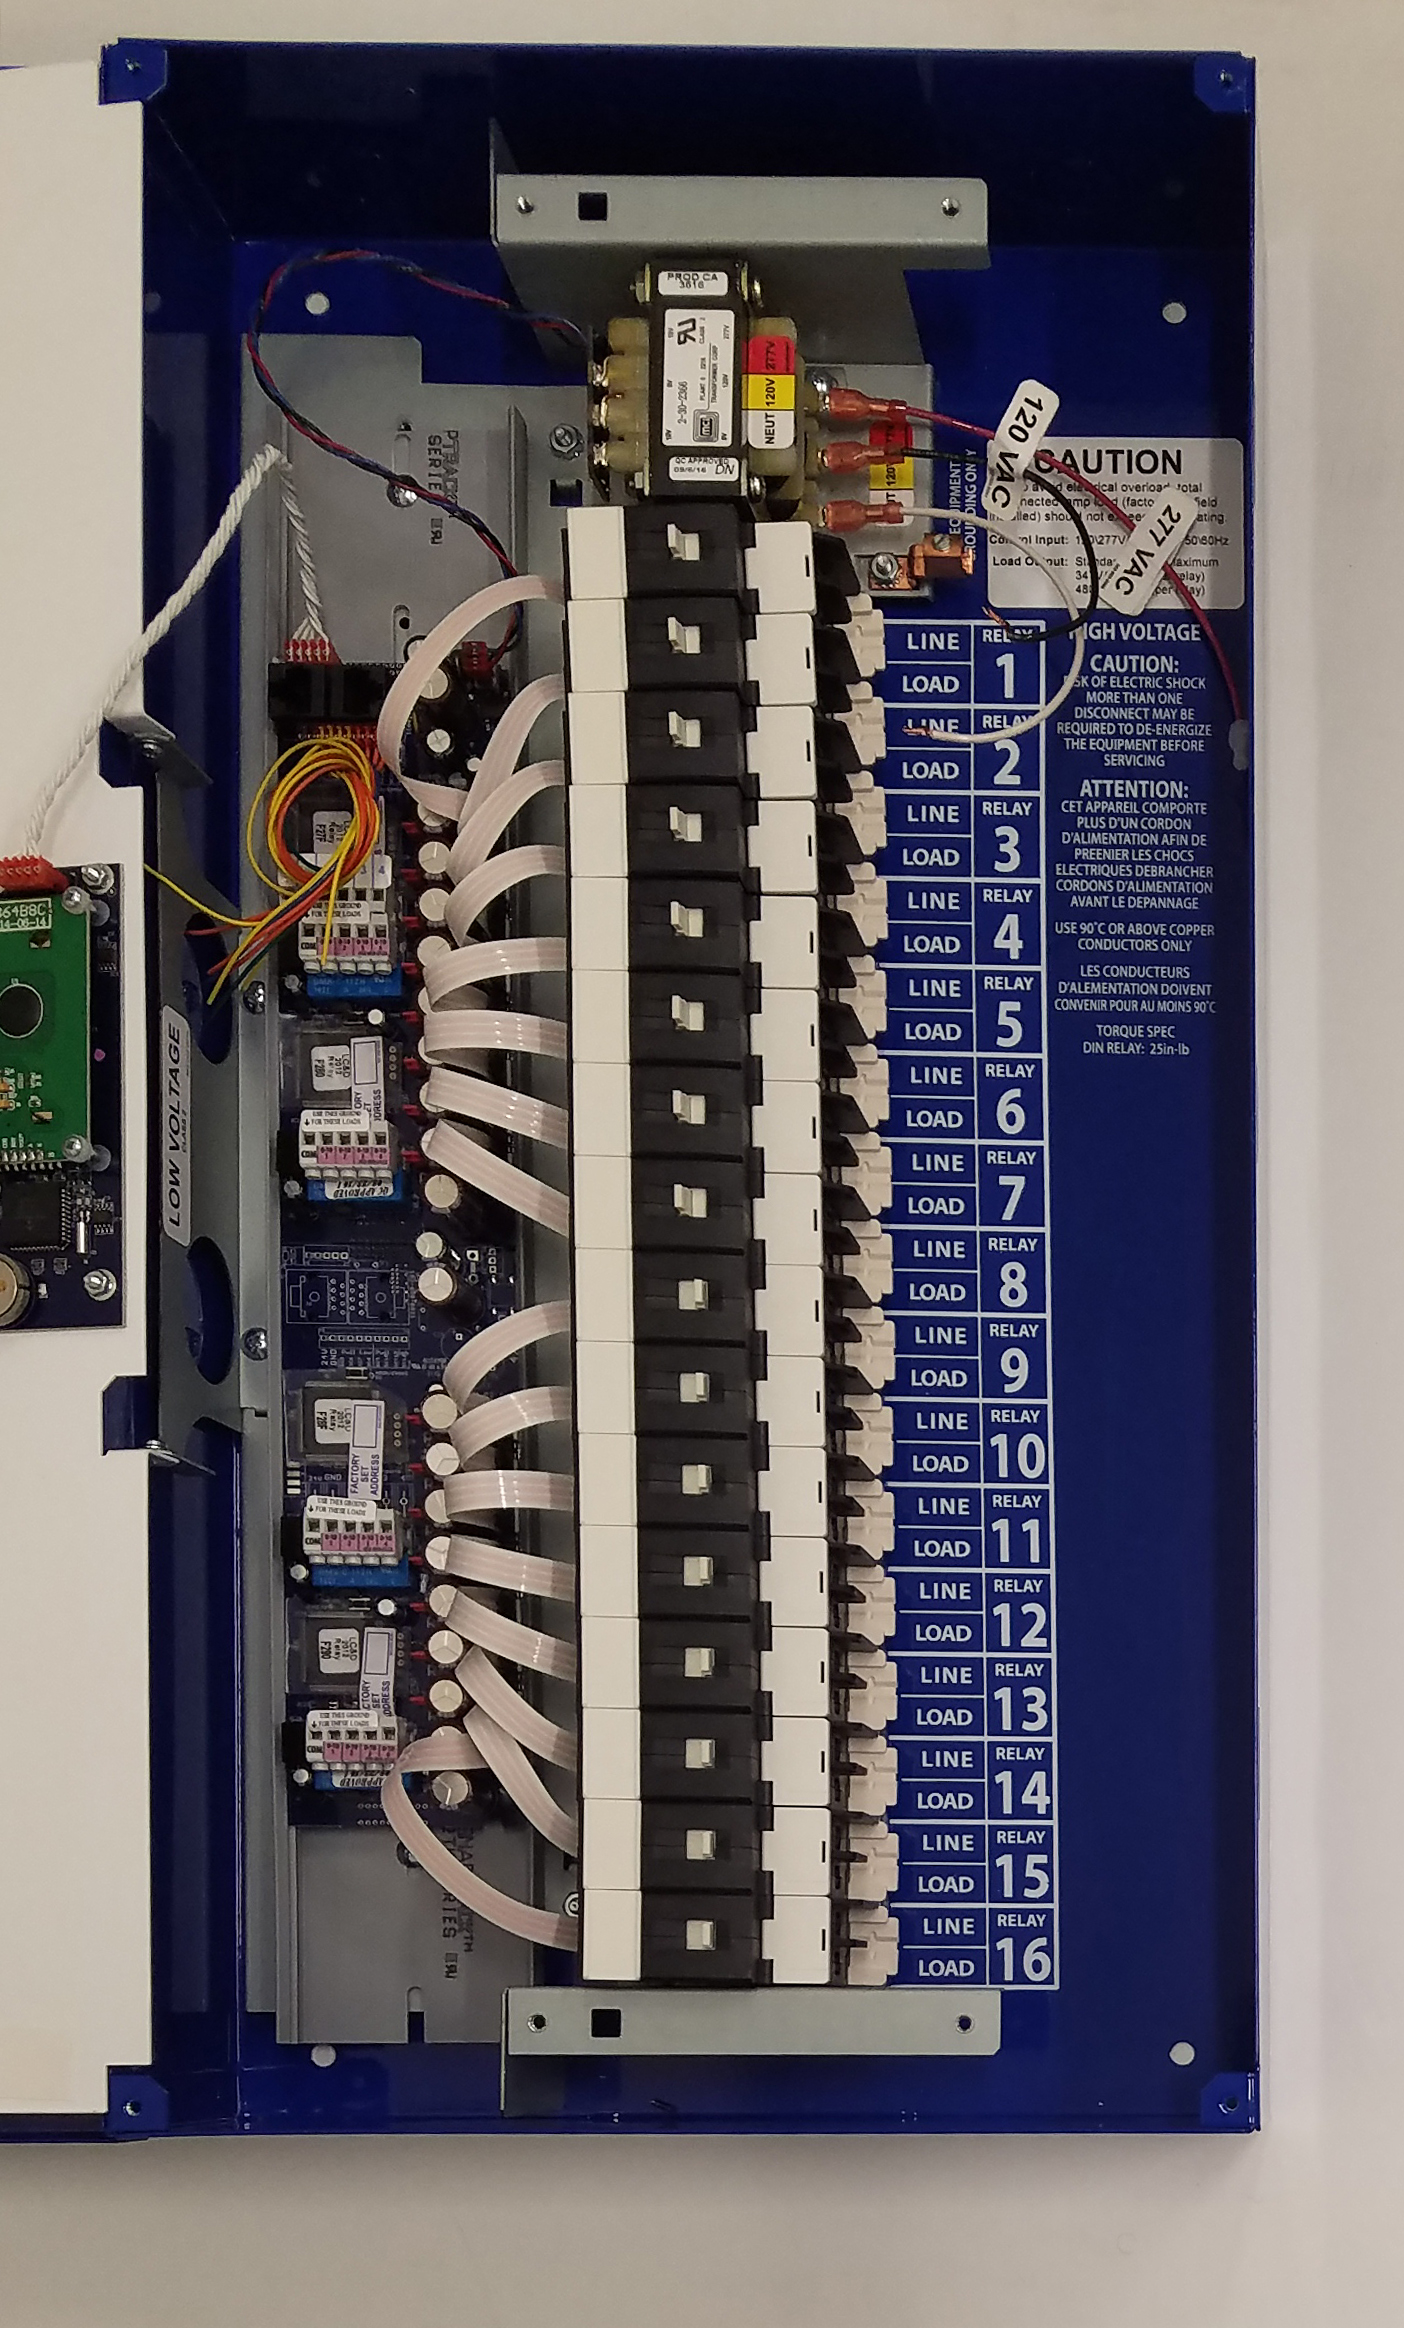 hight resolution of gr1416 ltd lc d 16 relay dimming blue box lighting control panel literite controls